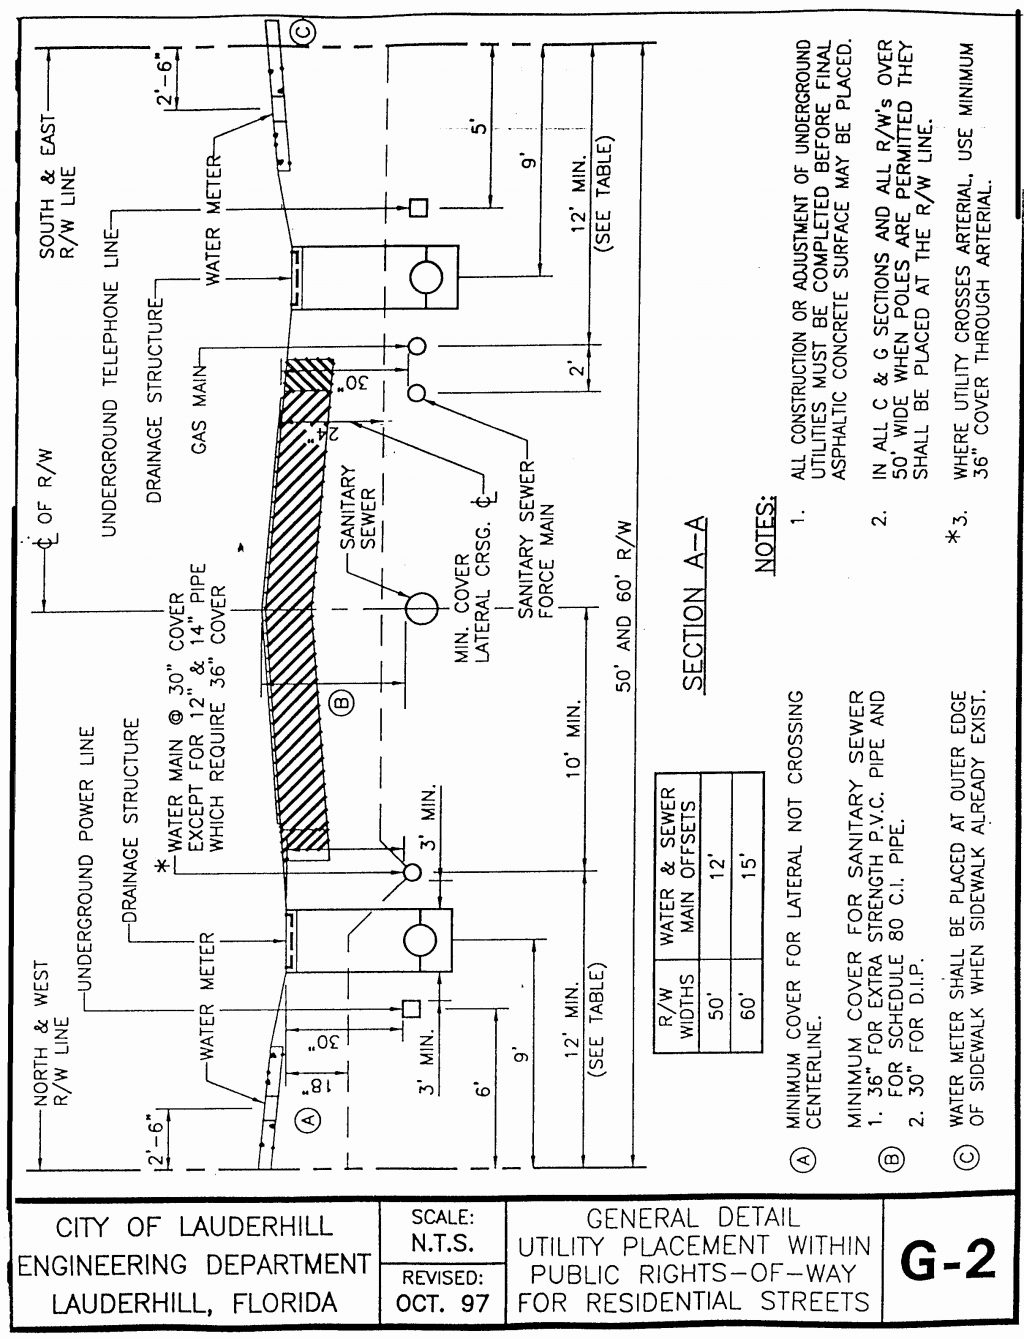 Drainage Calculationt Ashrae Load Xls New Report Template Throughout Drainage Report Template